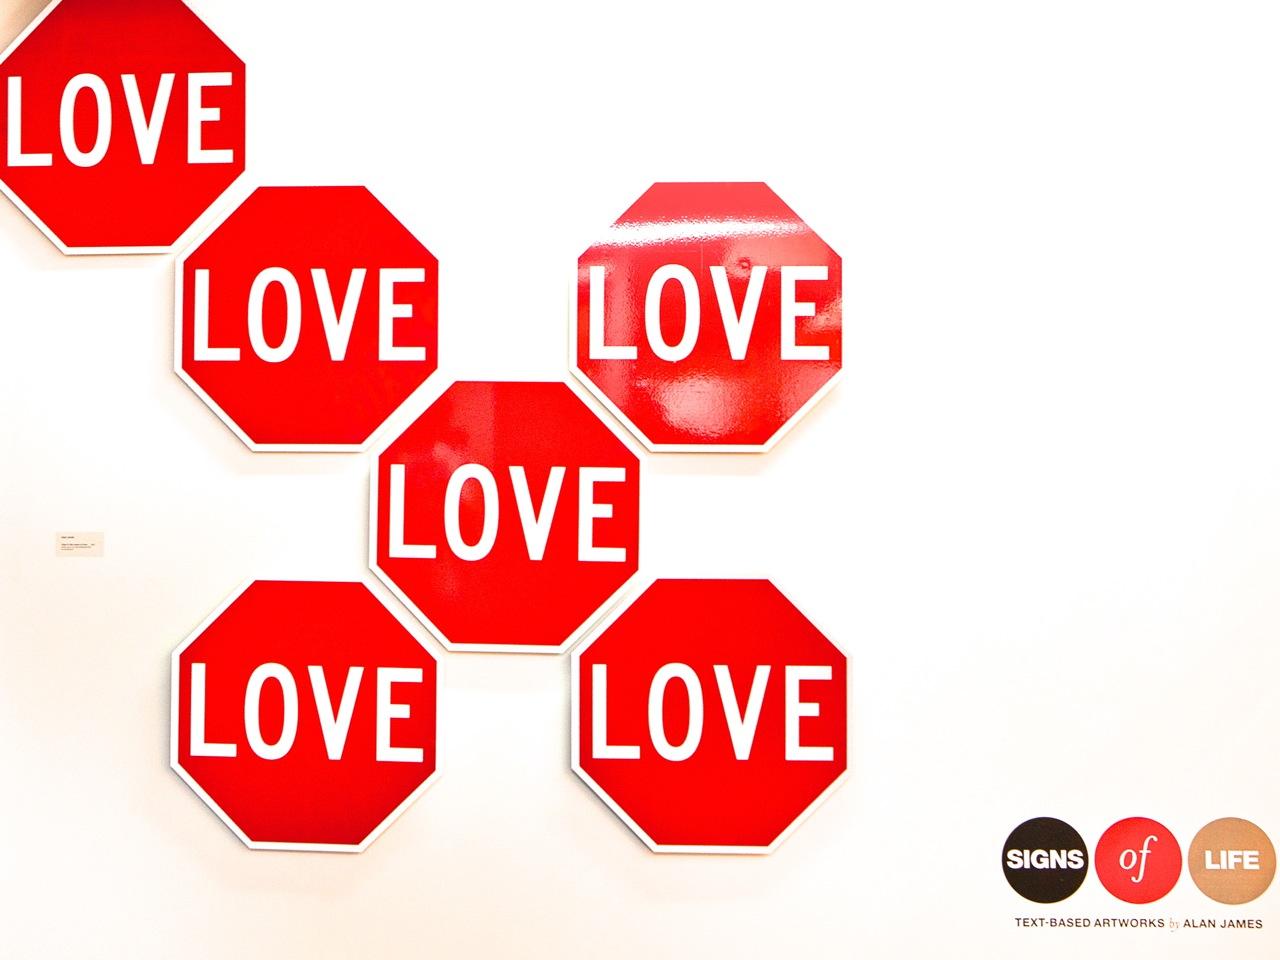 Love Sign - Redland Art Gallery 1